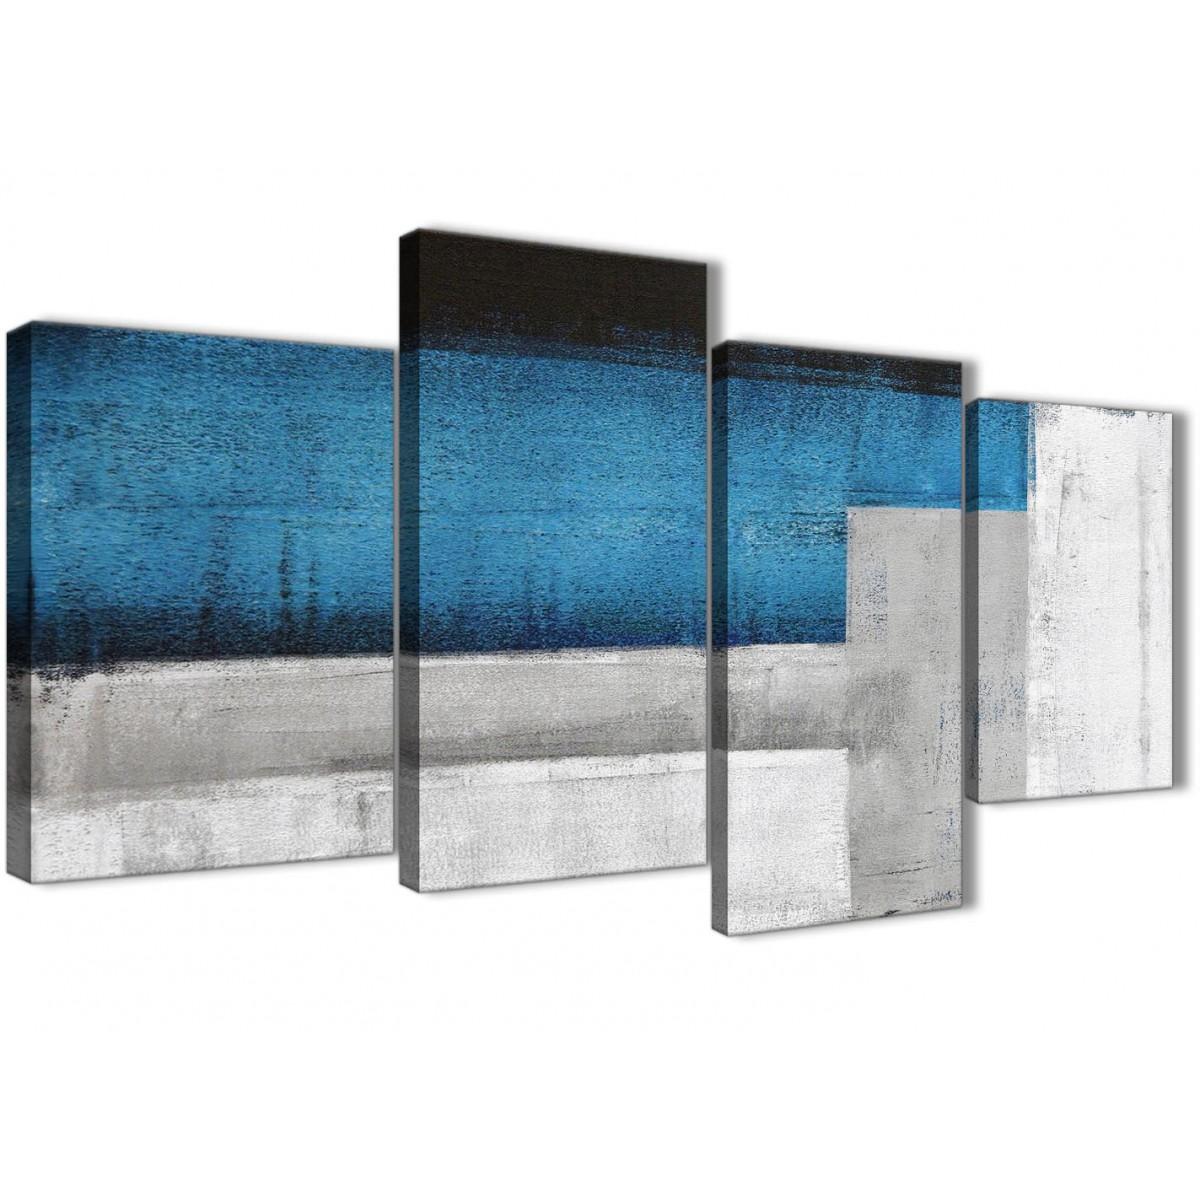 Bedroom Canvas Wall Art Uk: Large Blue Grey Painting Abstract Bedroom Canvas Wall Art